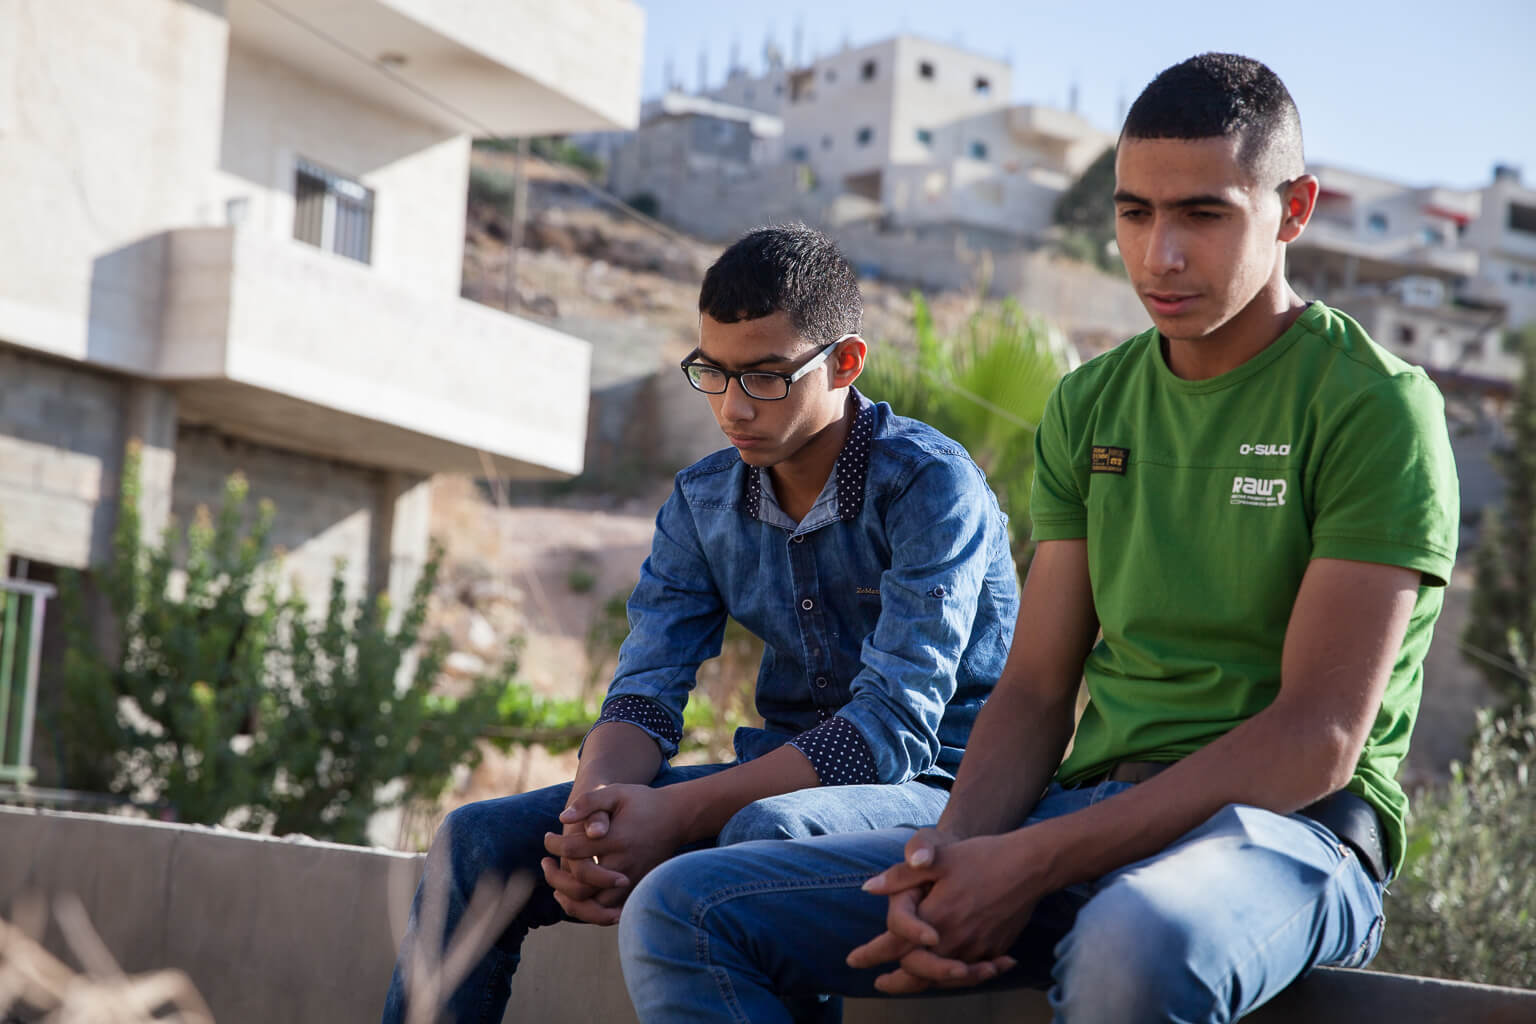 Mahmoud Al-Jafari, brother of JIhad, and a friend, sit at Jihad's grave. (Photo: Rebecca George)